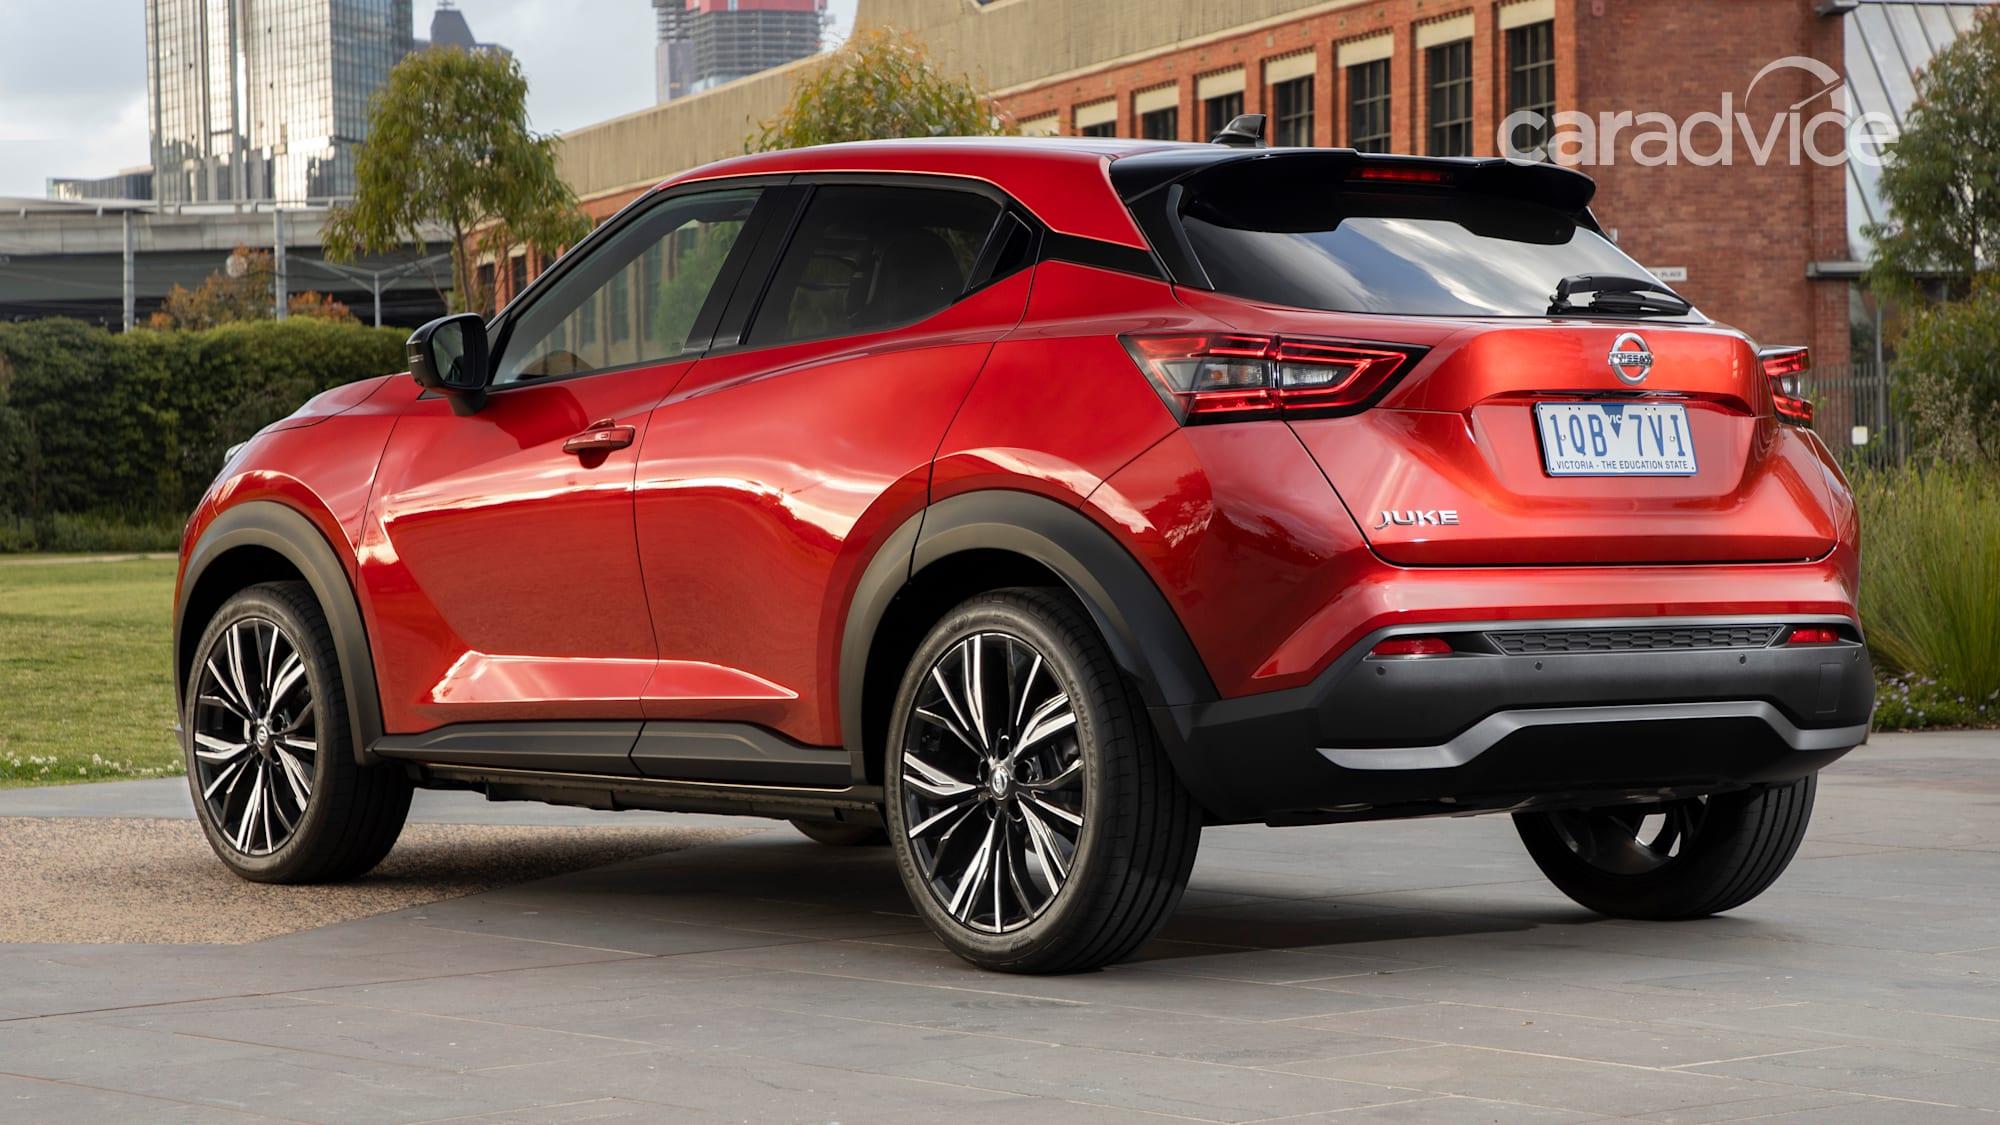 2020 Nissan Juke price and specs   CarAdvice